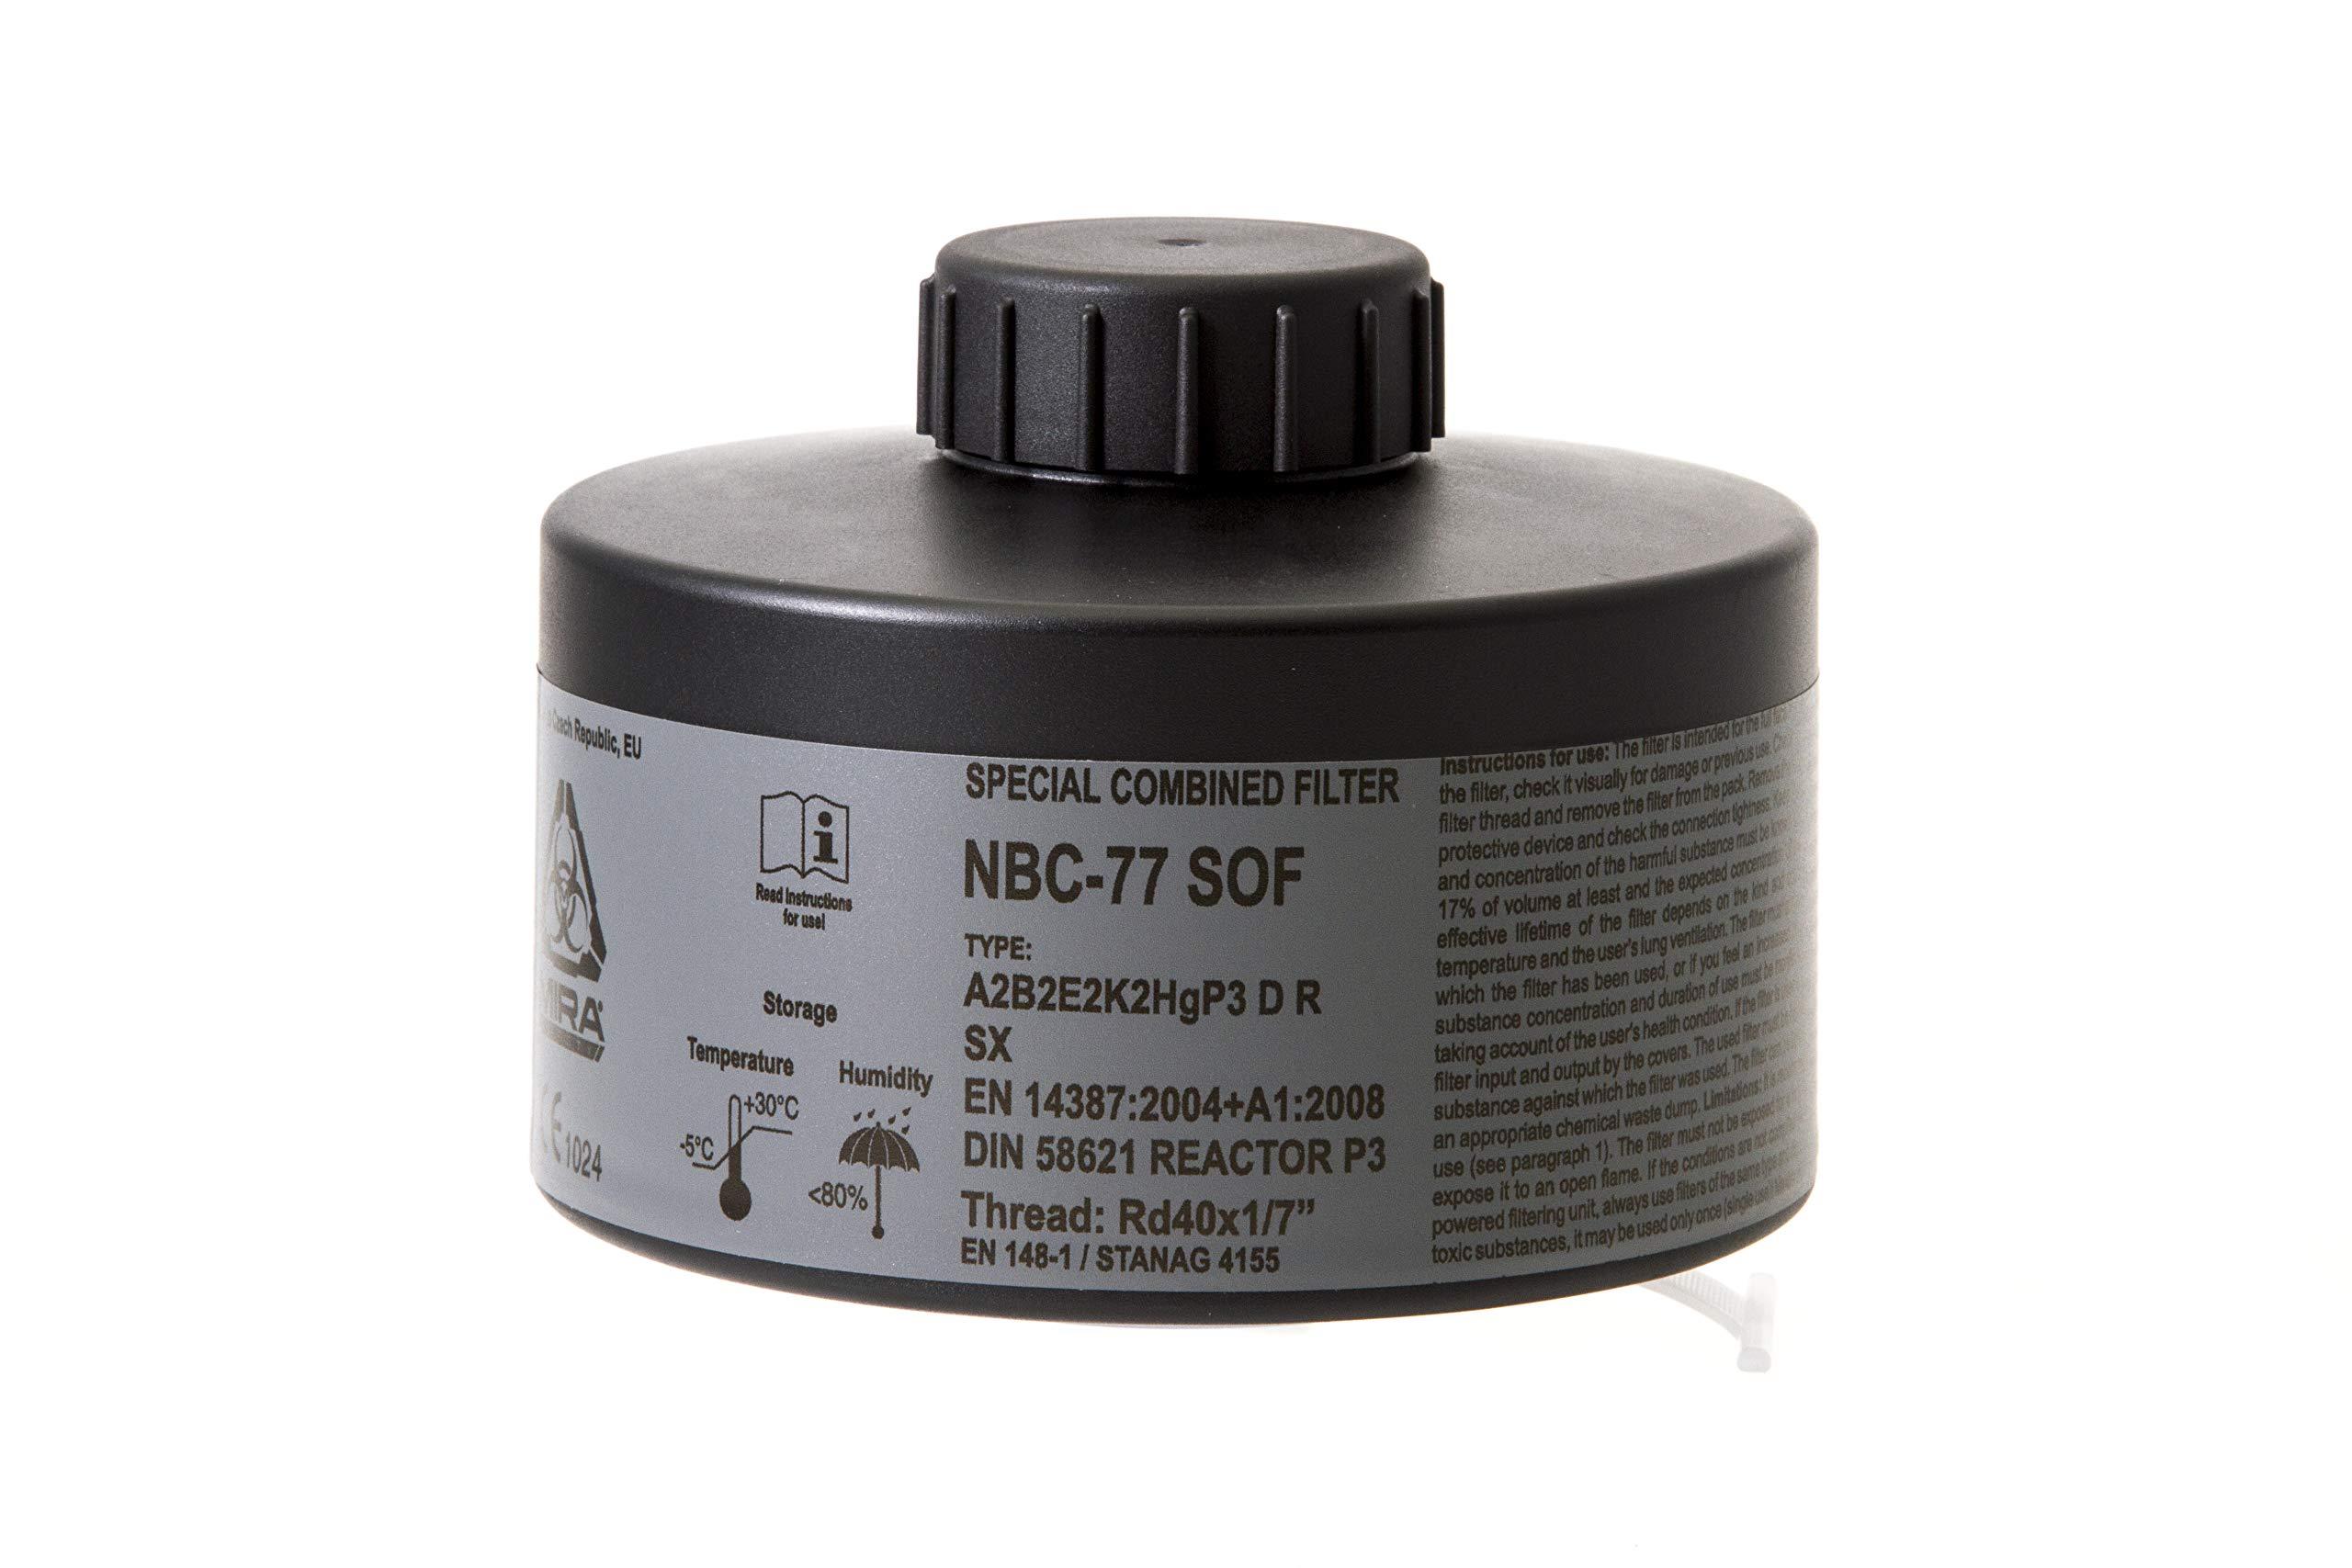 MIRA Multi Gas Vapor Cartridge Respiratory Protection 20 Years Shelf Life CBRN NBC Grade (Mira Filter) by MIRA SAFETY M (Image #5)